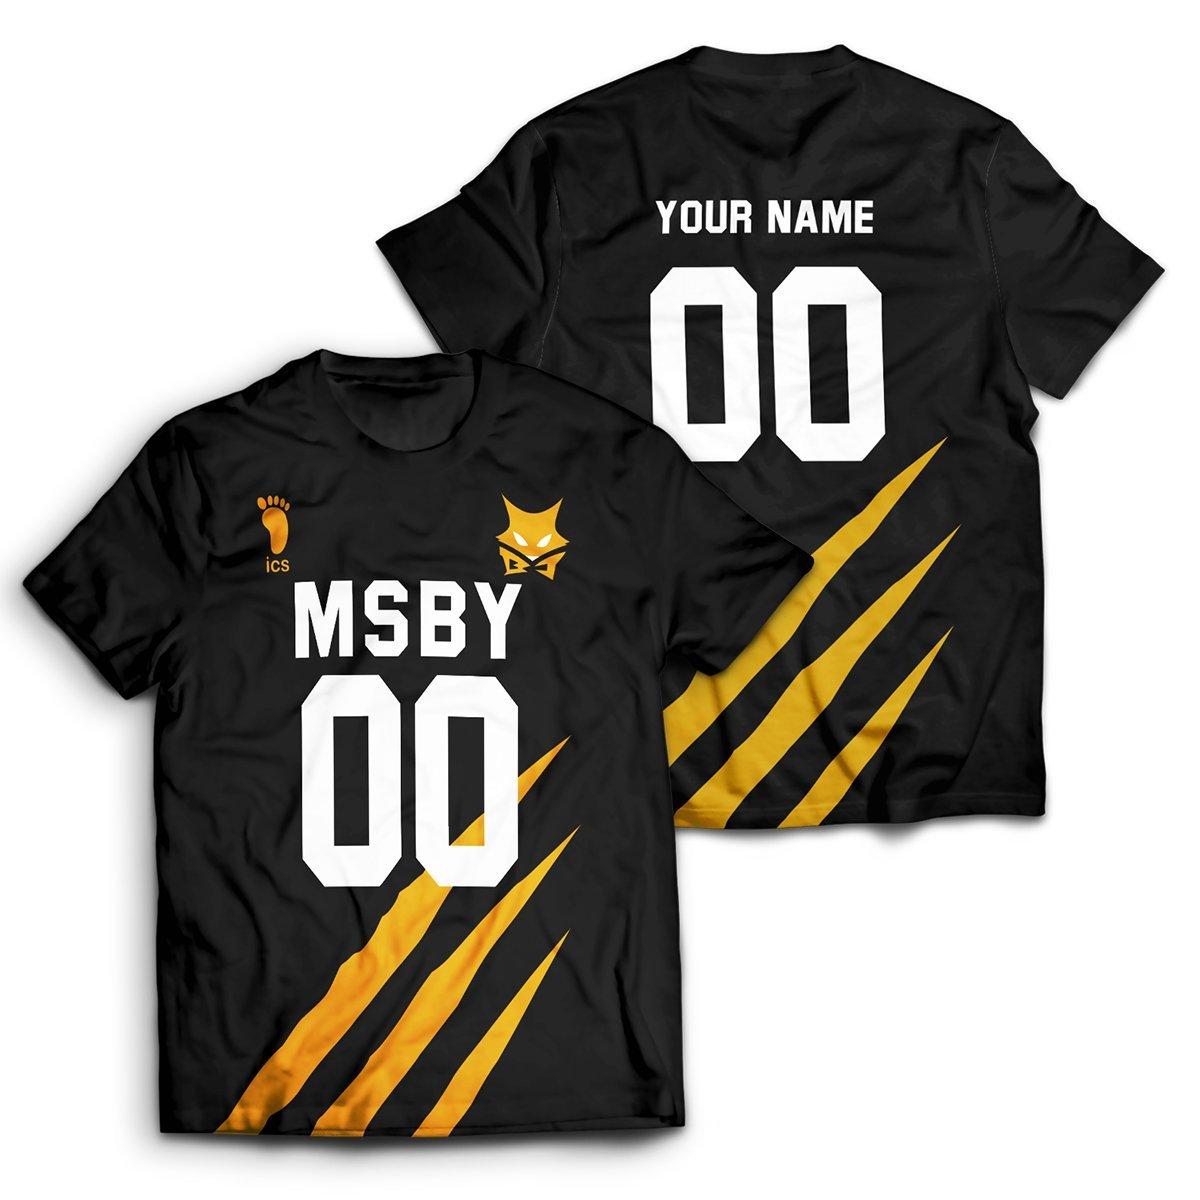 Personalized MSBY Black Jackals Unisex T-Shirt FDM2909 S Official Otaku Treat Merch